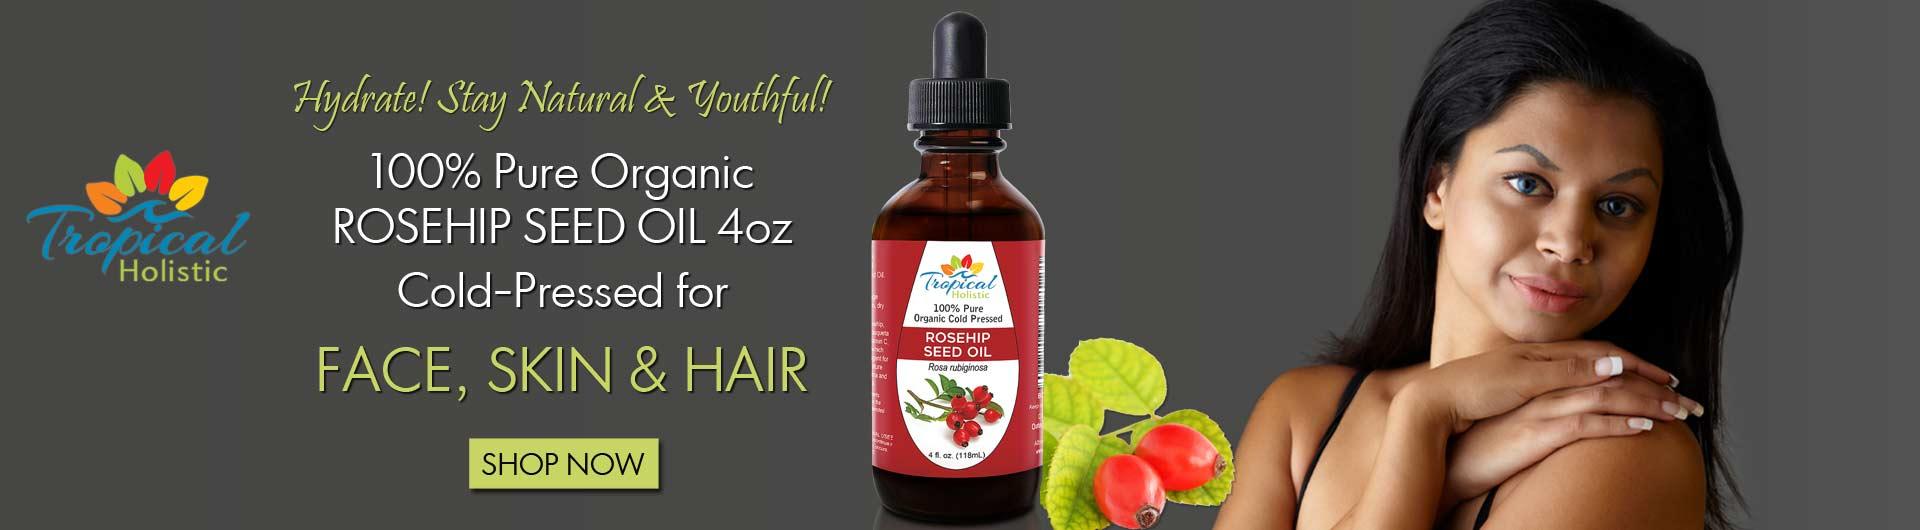 Tropical Holistic Rosehip Seed Oil